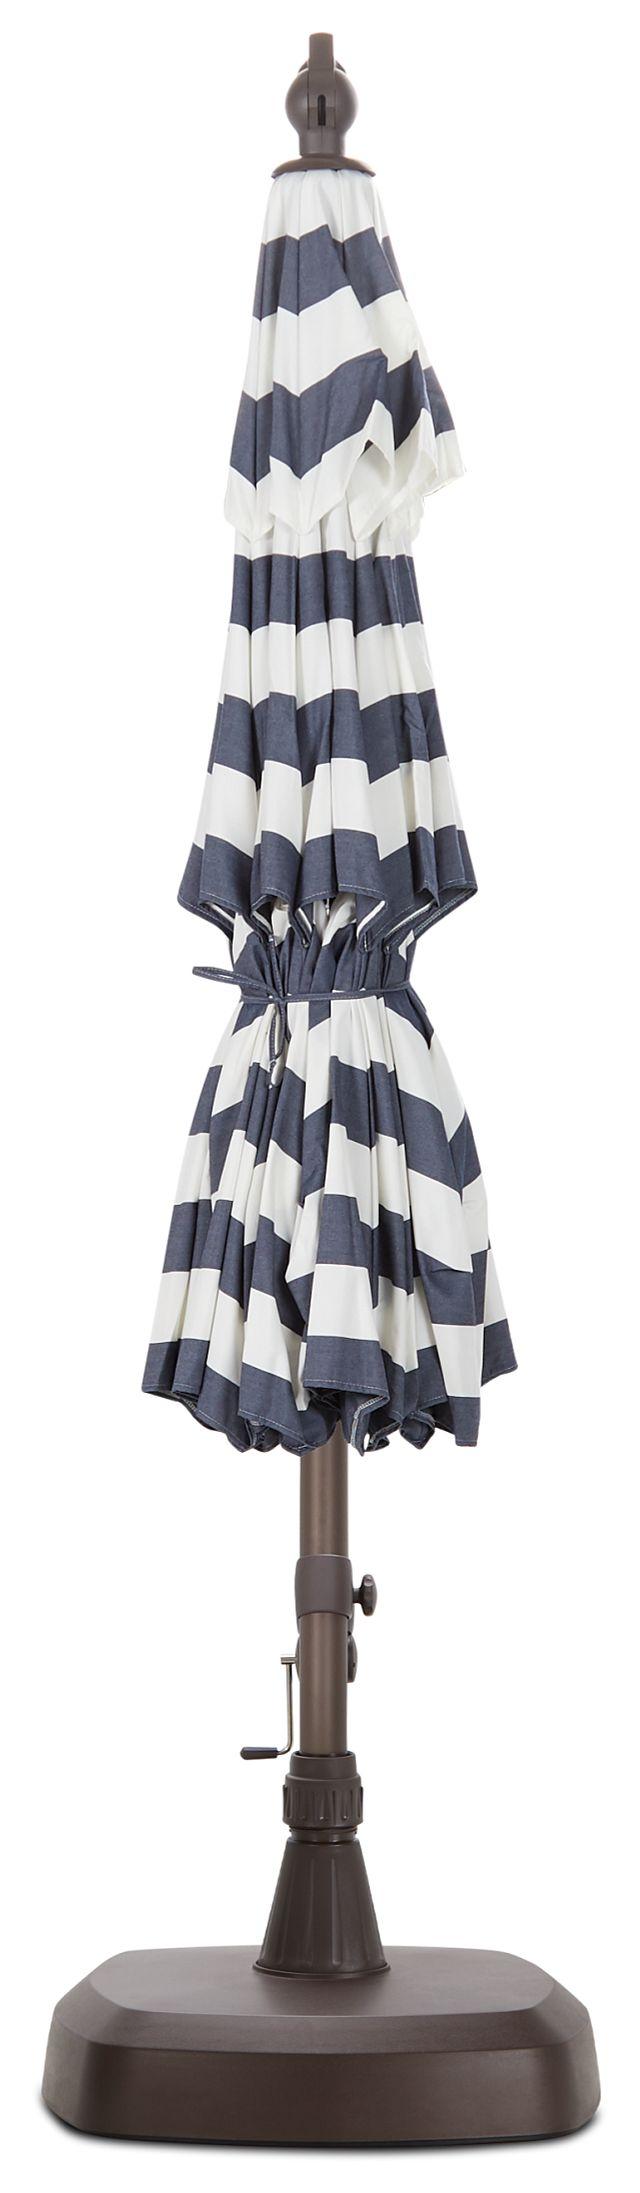 Cayman Dark Blue Stripe Cantilever Umbrella Set (3)